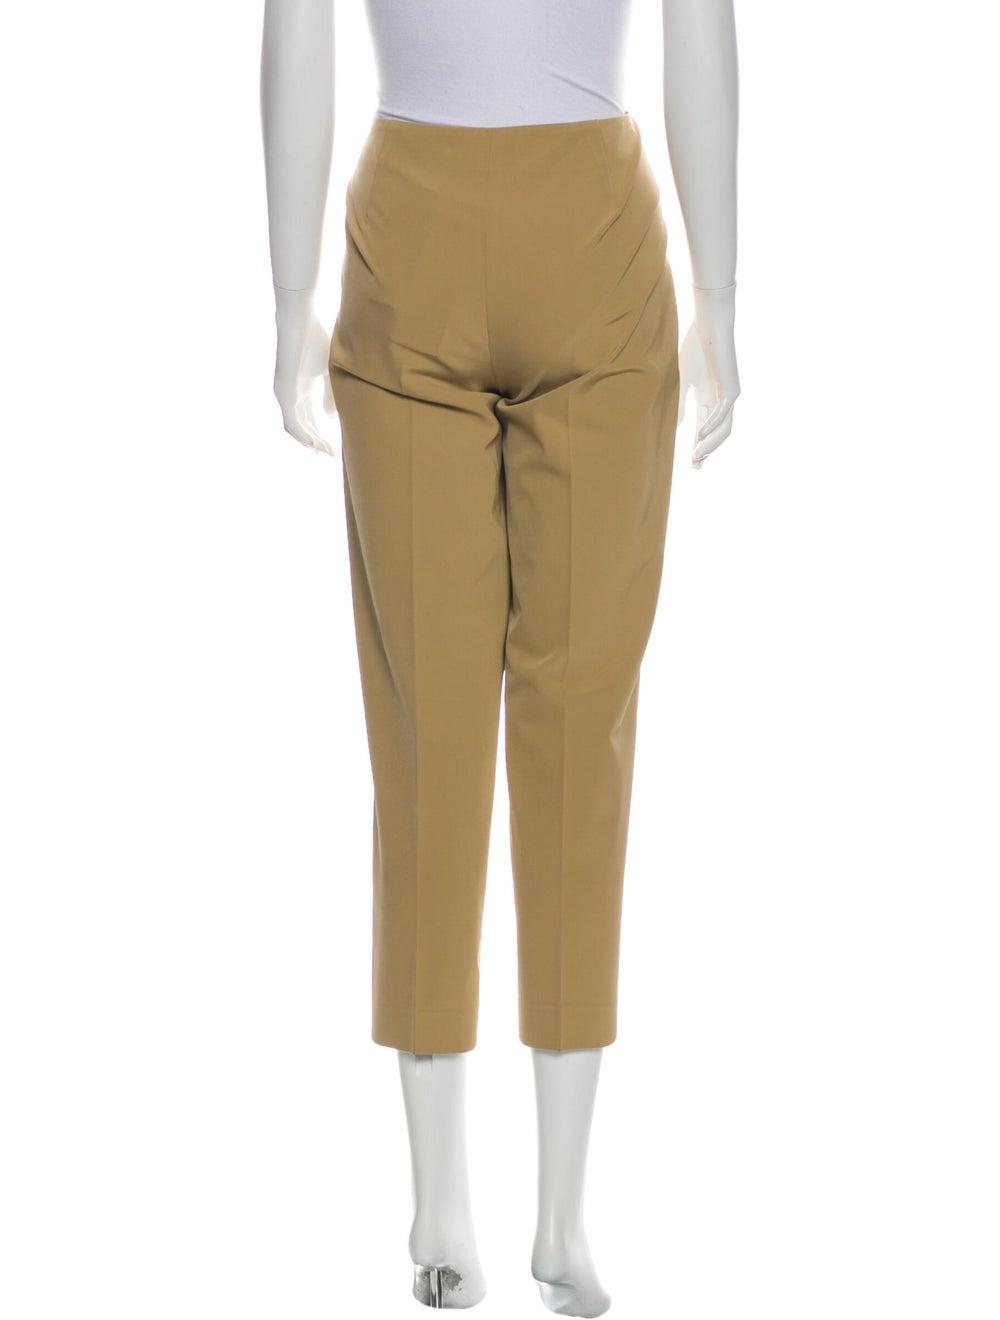 Prada Straight Leg Pants - image 3